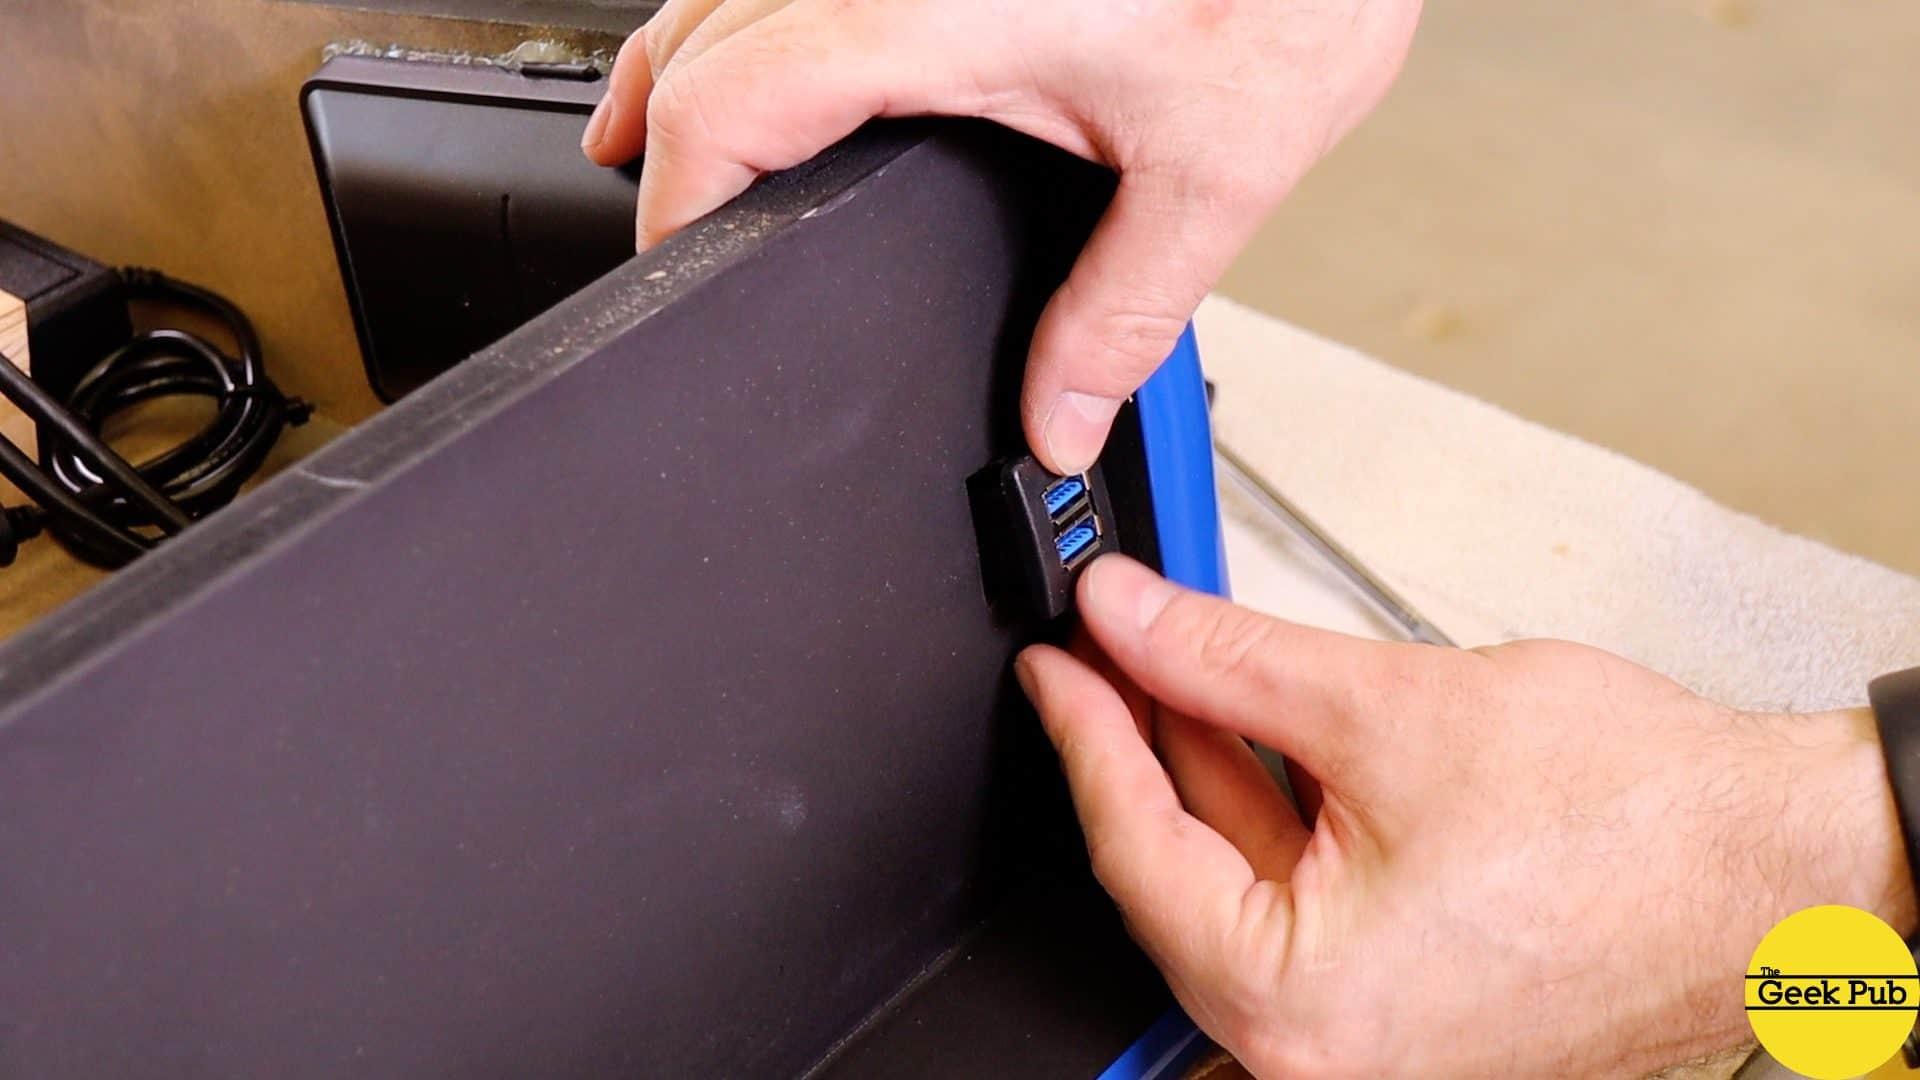 Installing the USB ports